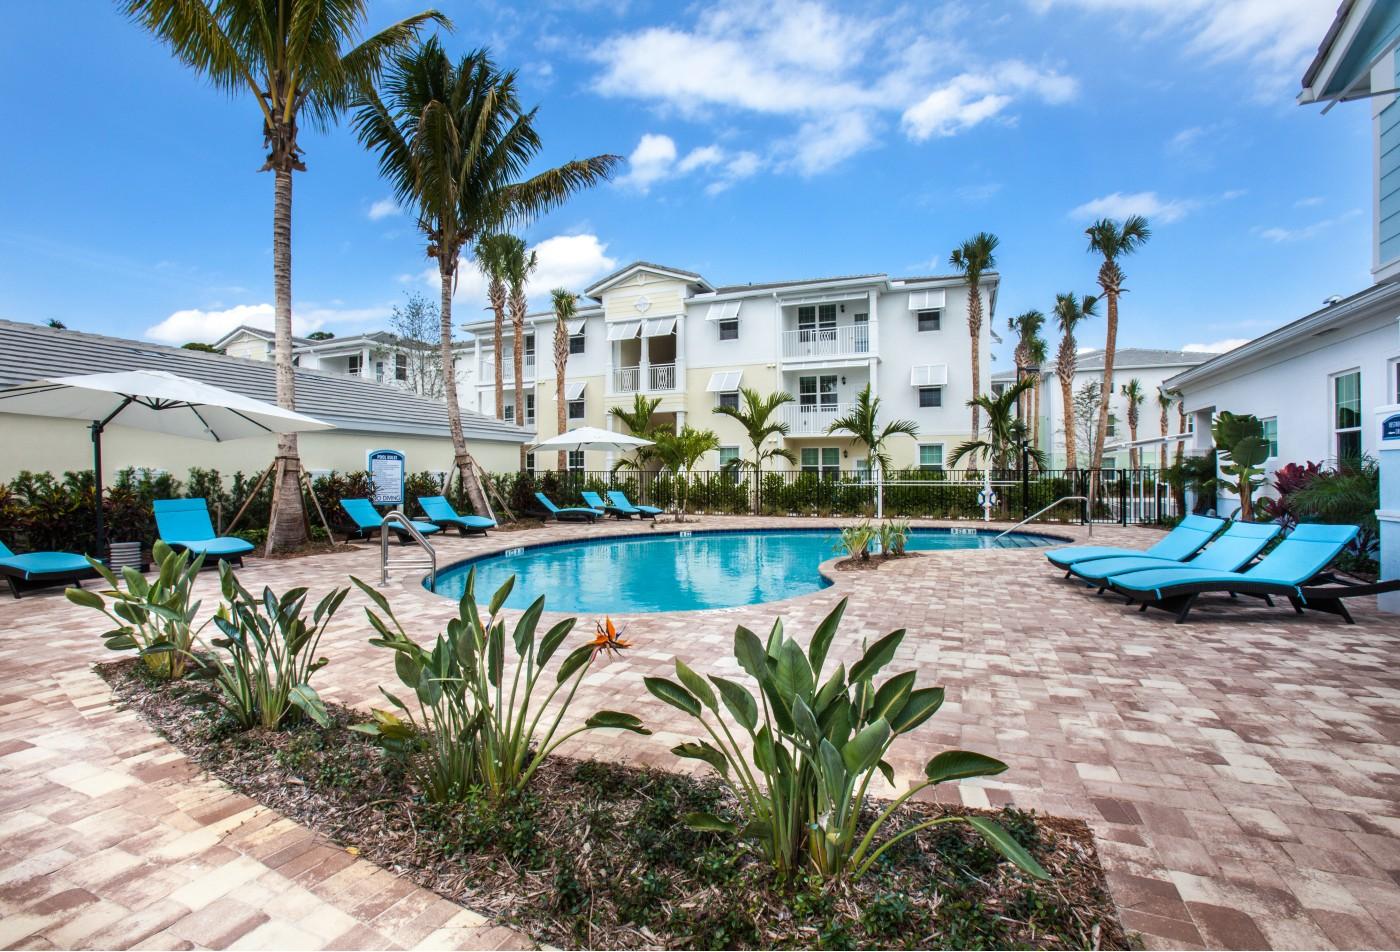 Swimming Pool | Apartment Homes in Boynton Beach, FL | High Ridge Landing